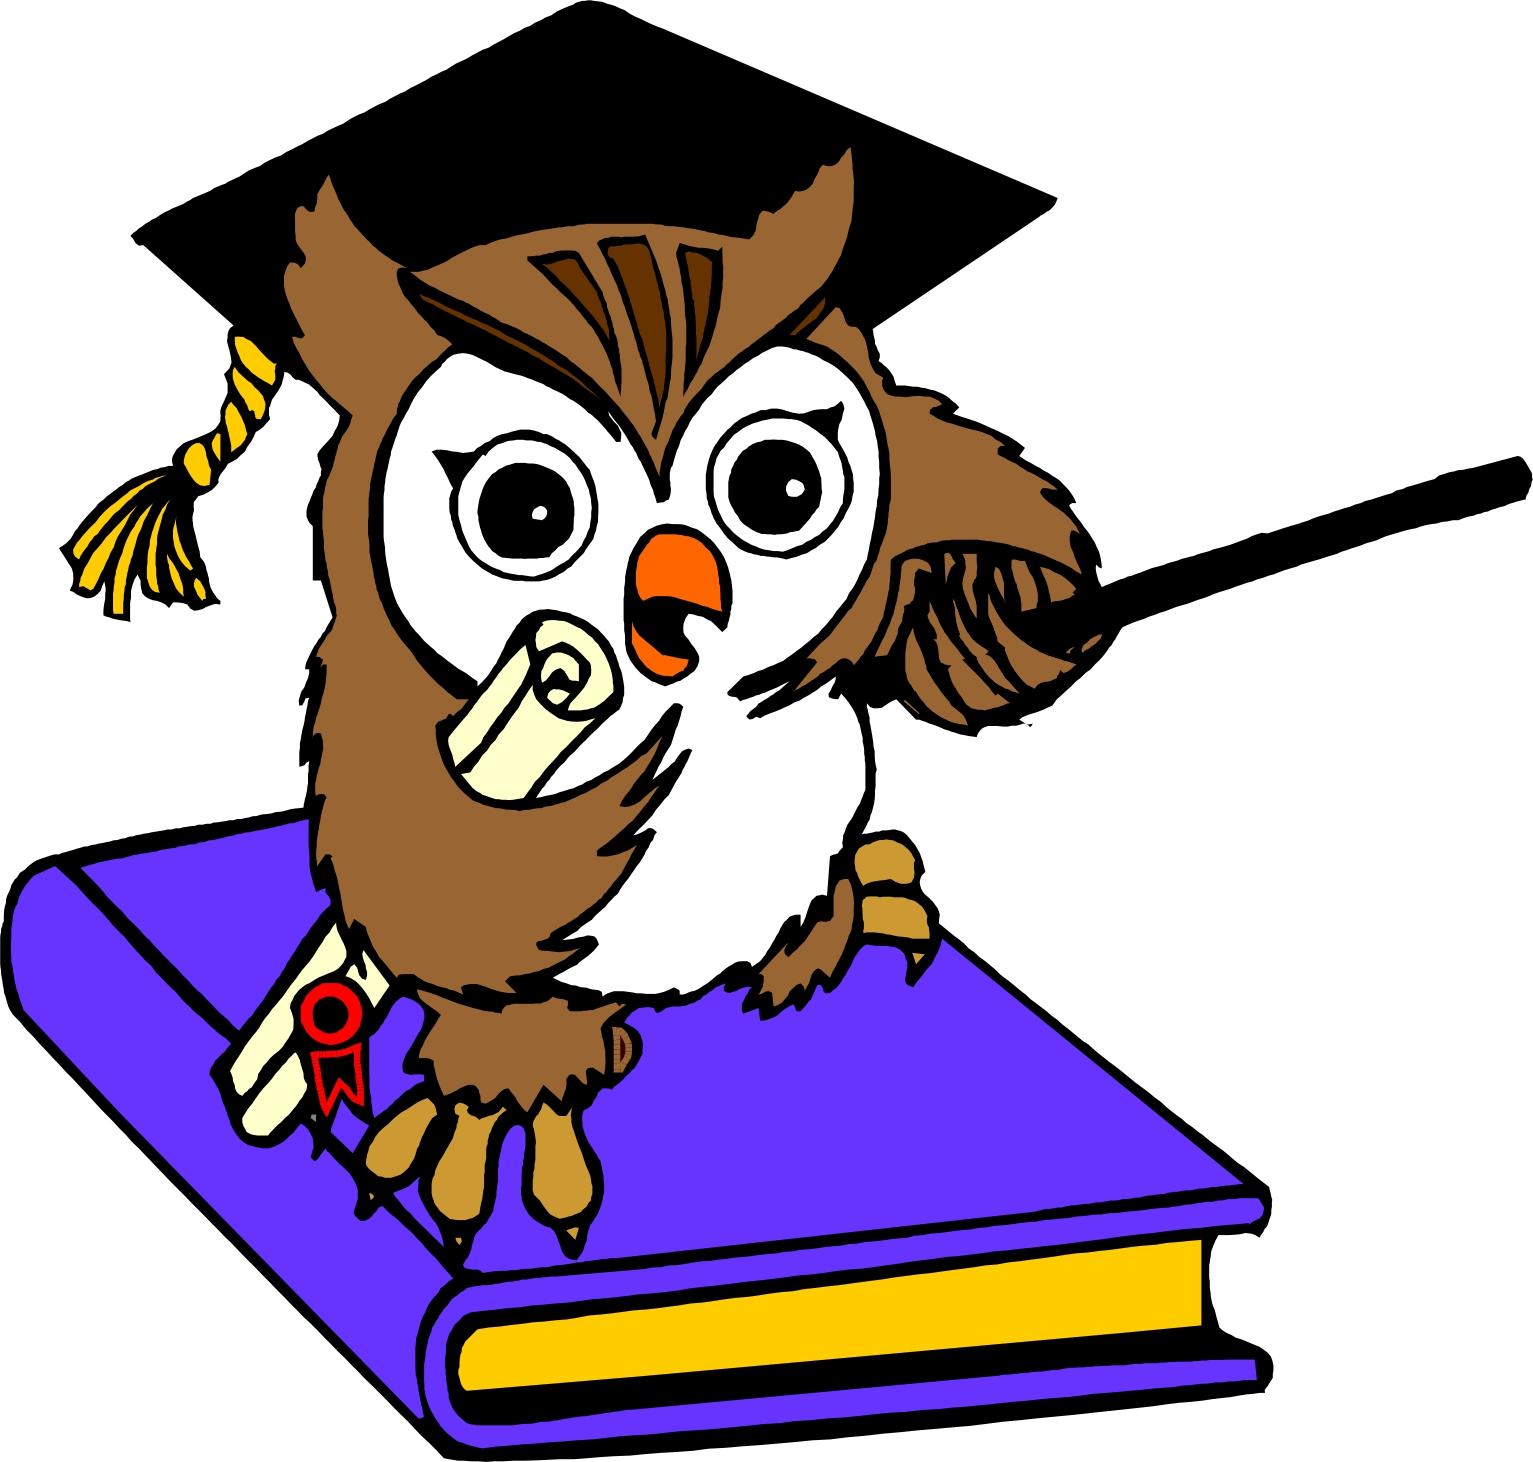 Wise Owl Cartoon.